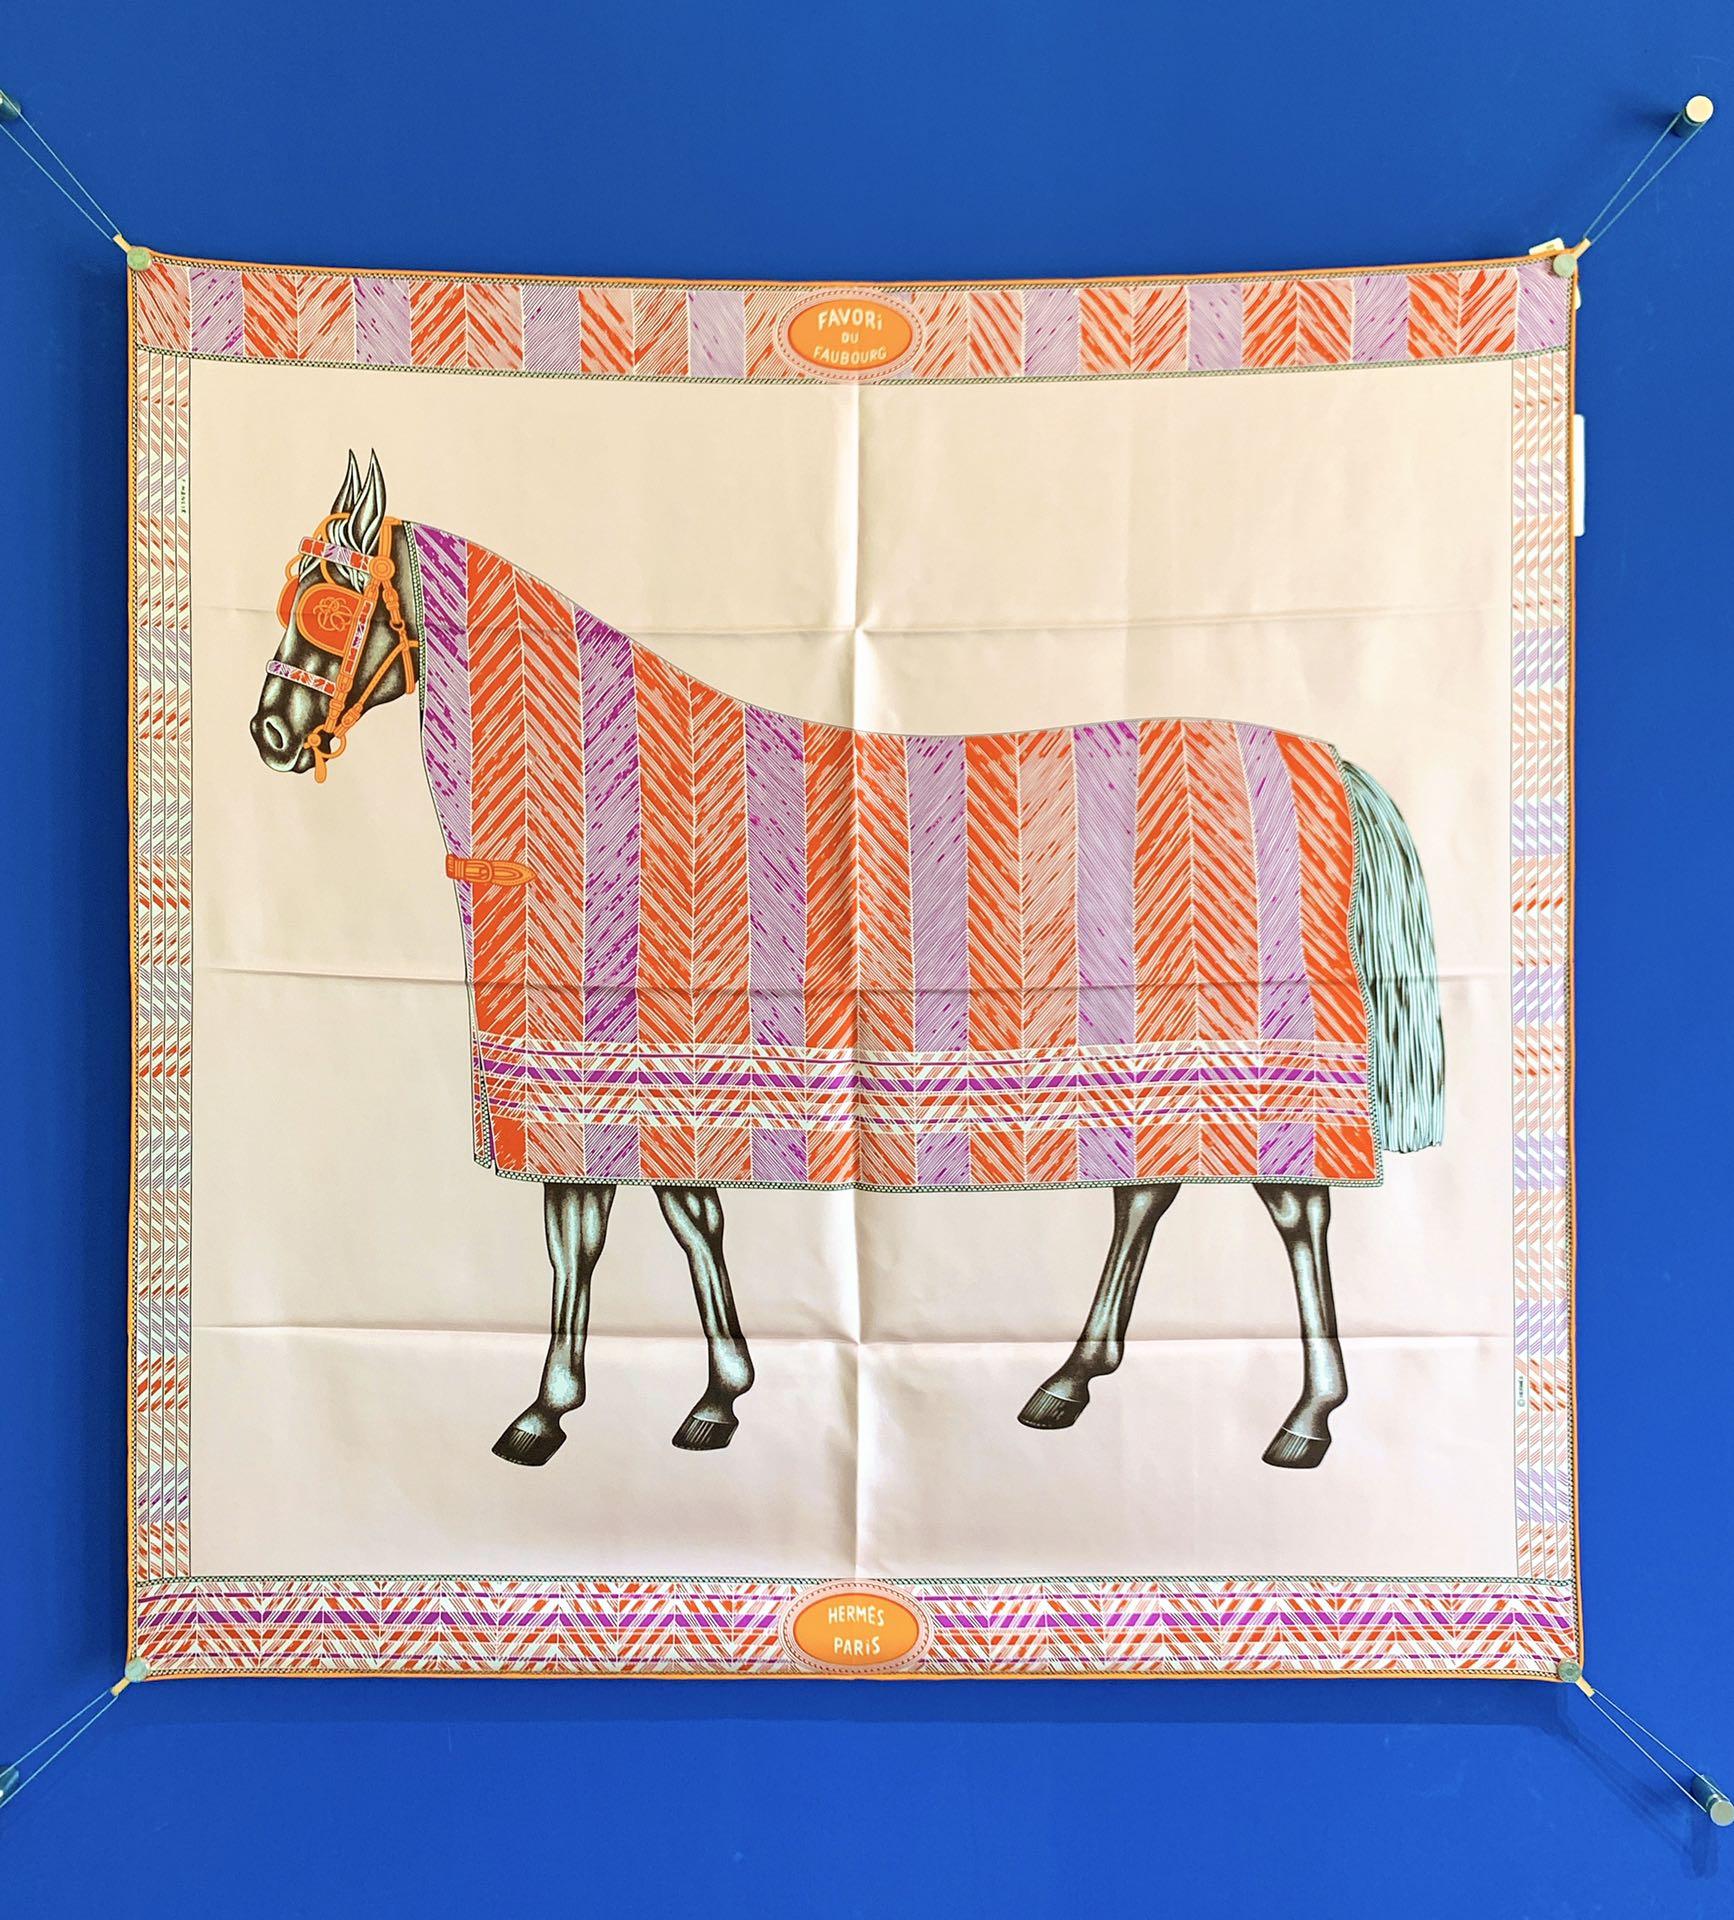 Hermes 新季度《骏马披挂》蚕丝方巾 《粉色》 20年新版骏马图案丝巾